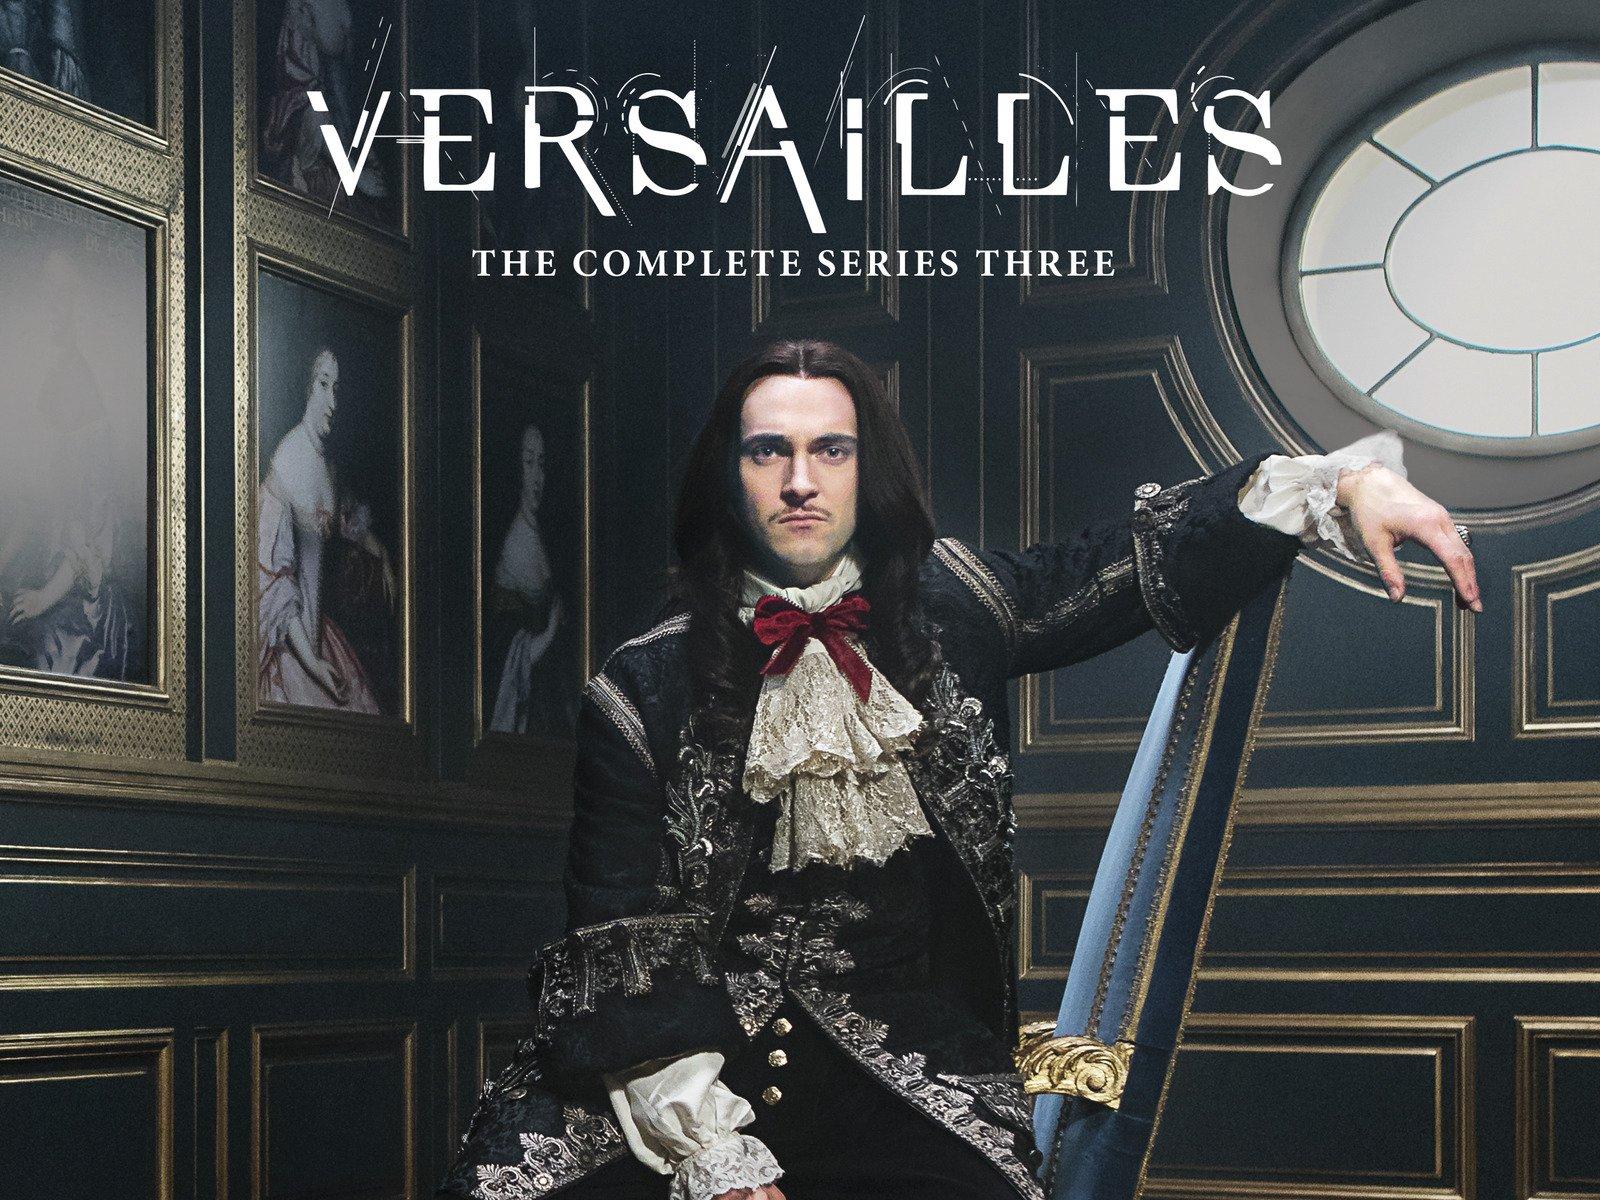 versailles series 2 episode 1 watch online